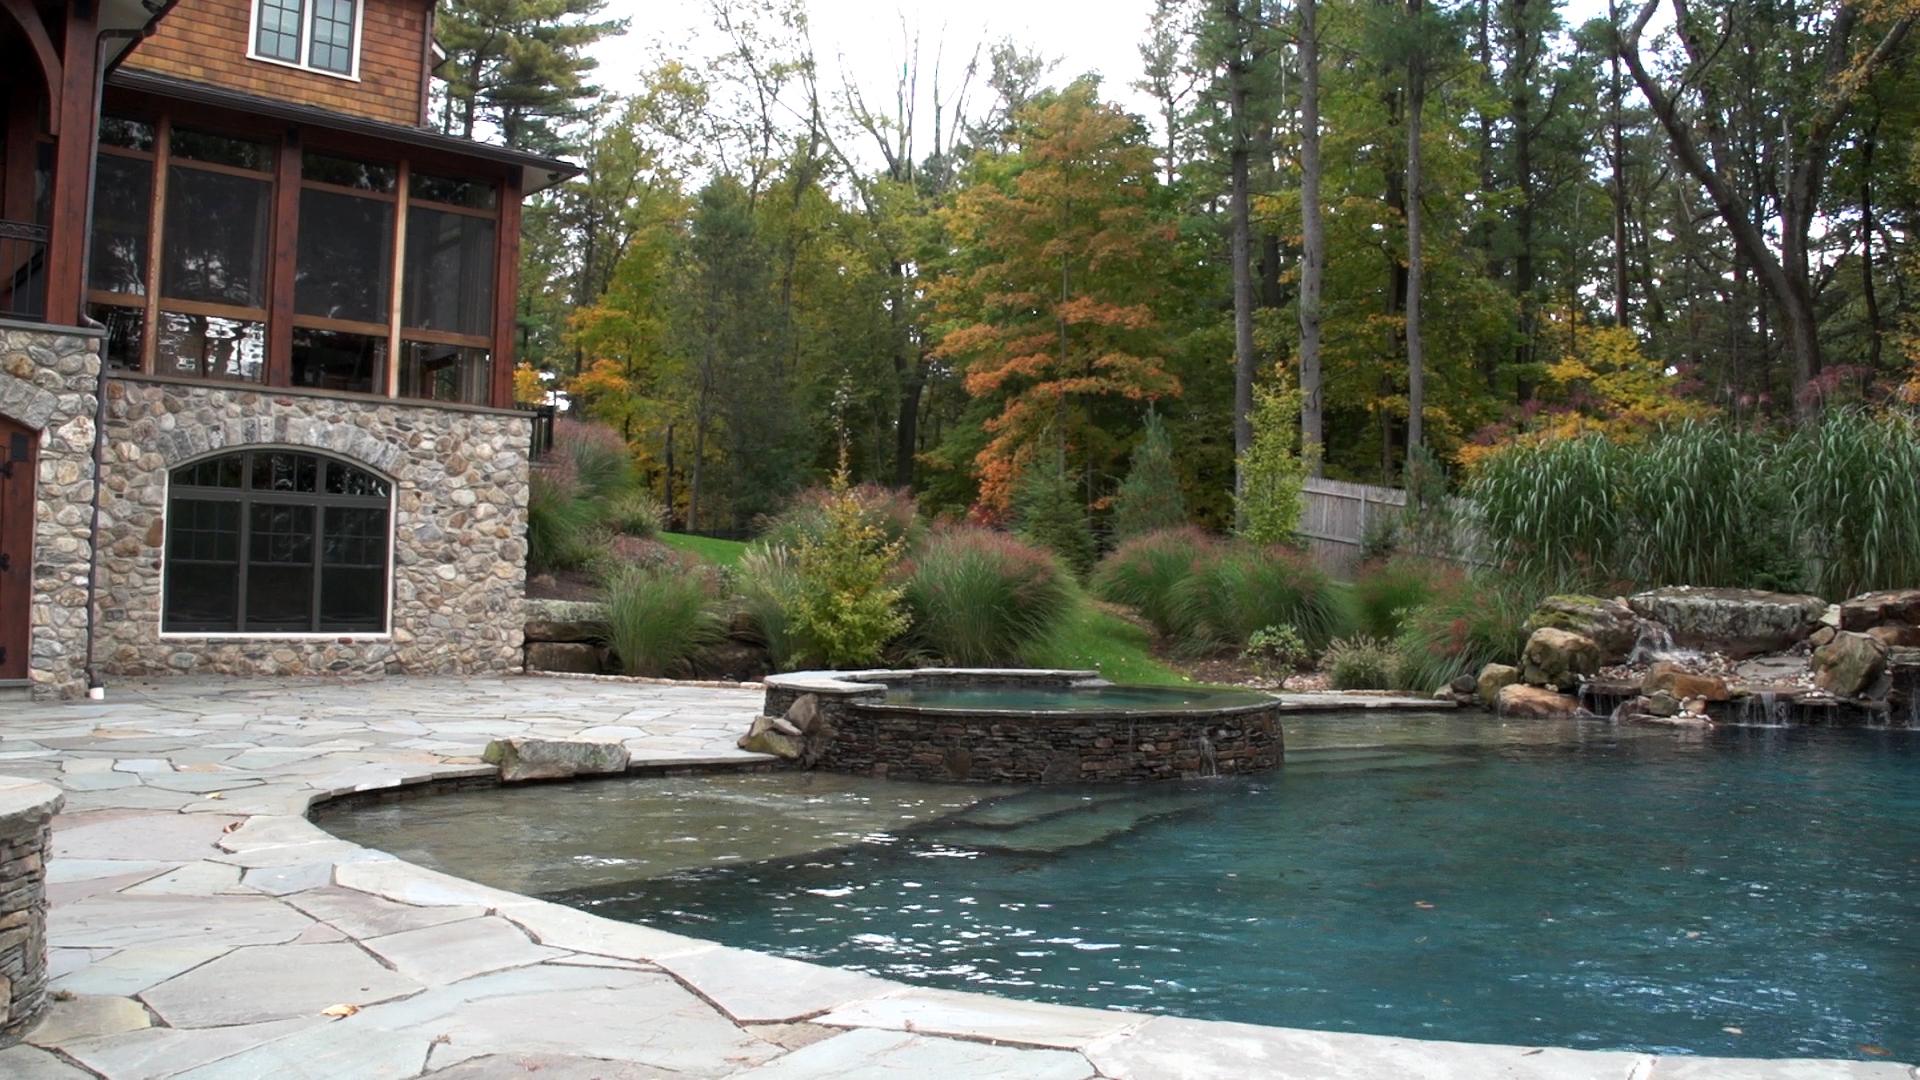 Connecticut Pool & Spa